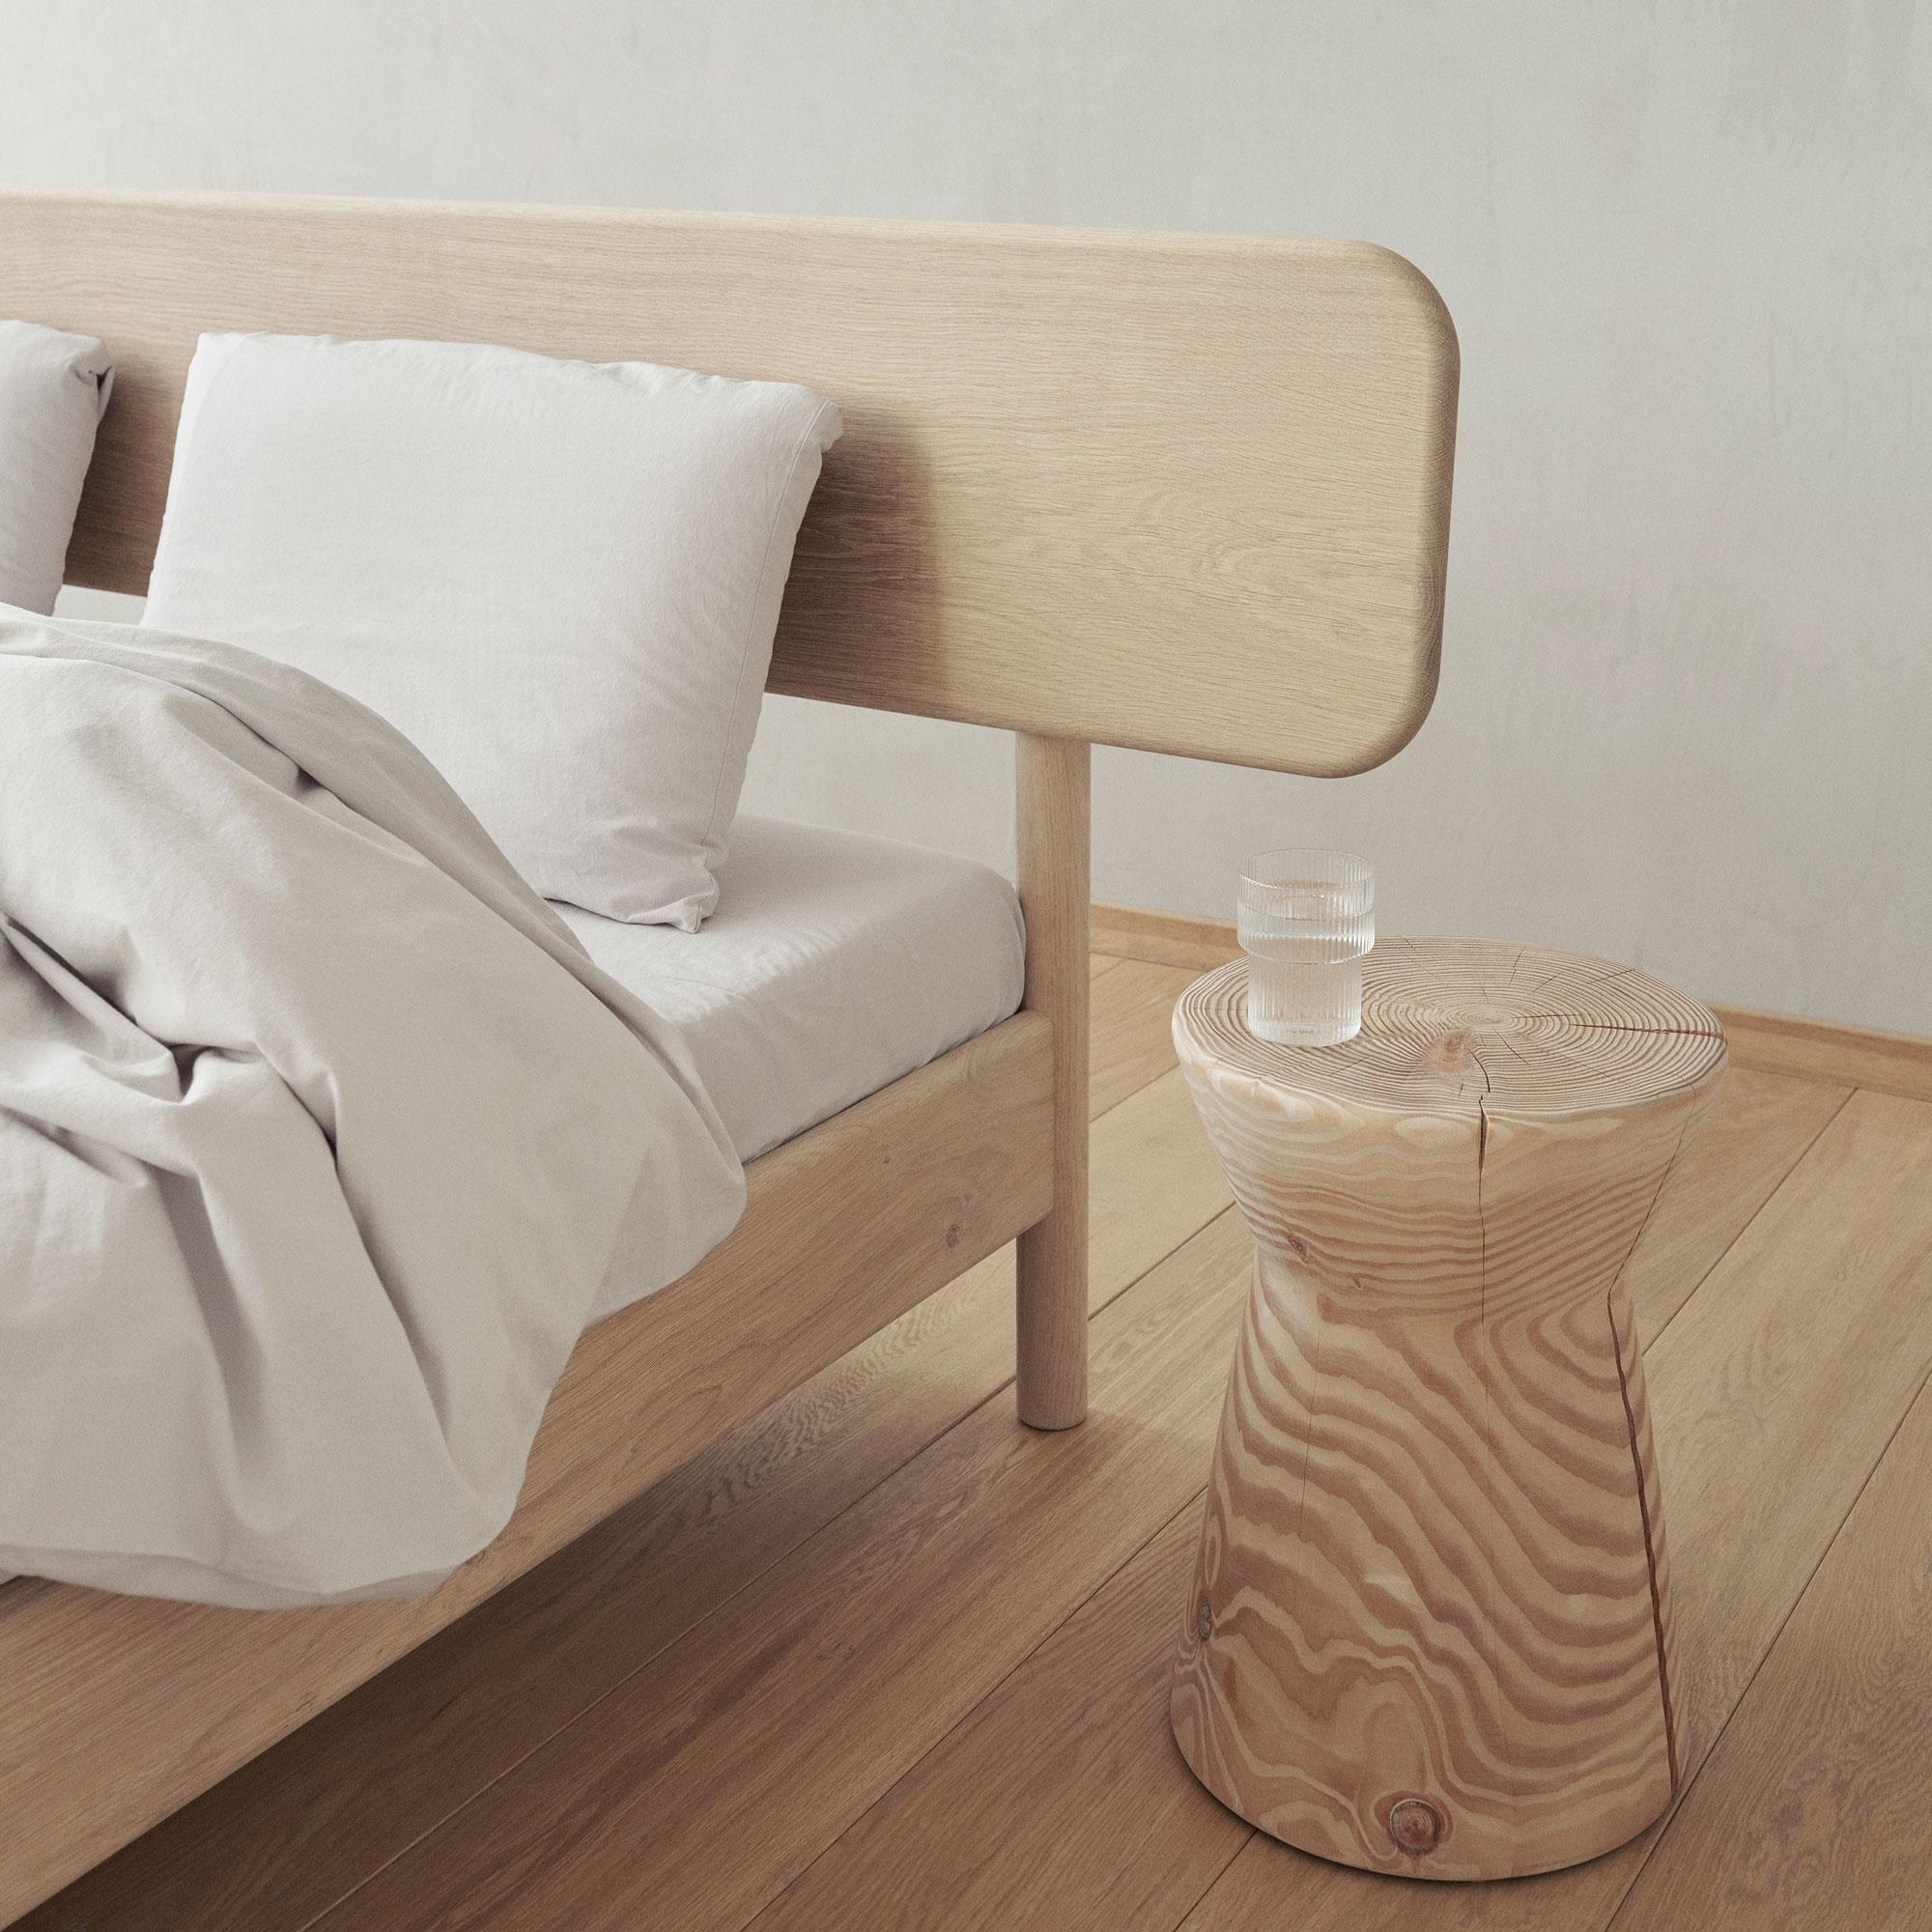 016-ALKEN-BED-AT-THE-LAB-RE-BEDS-DESIGN-BY-OLIVER-&-LUKAS-WEISSKROGH.jpg